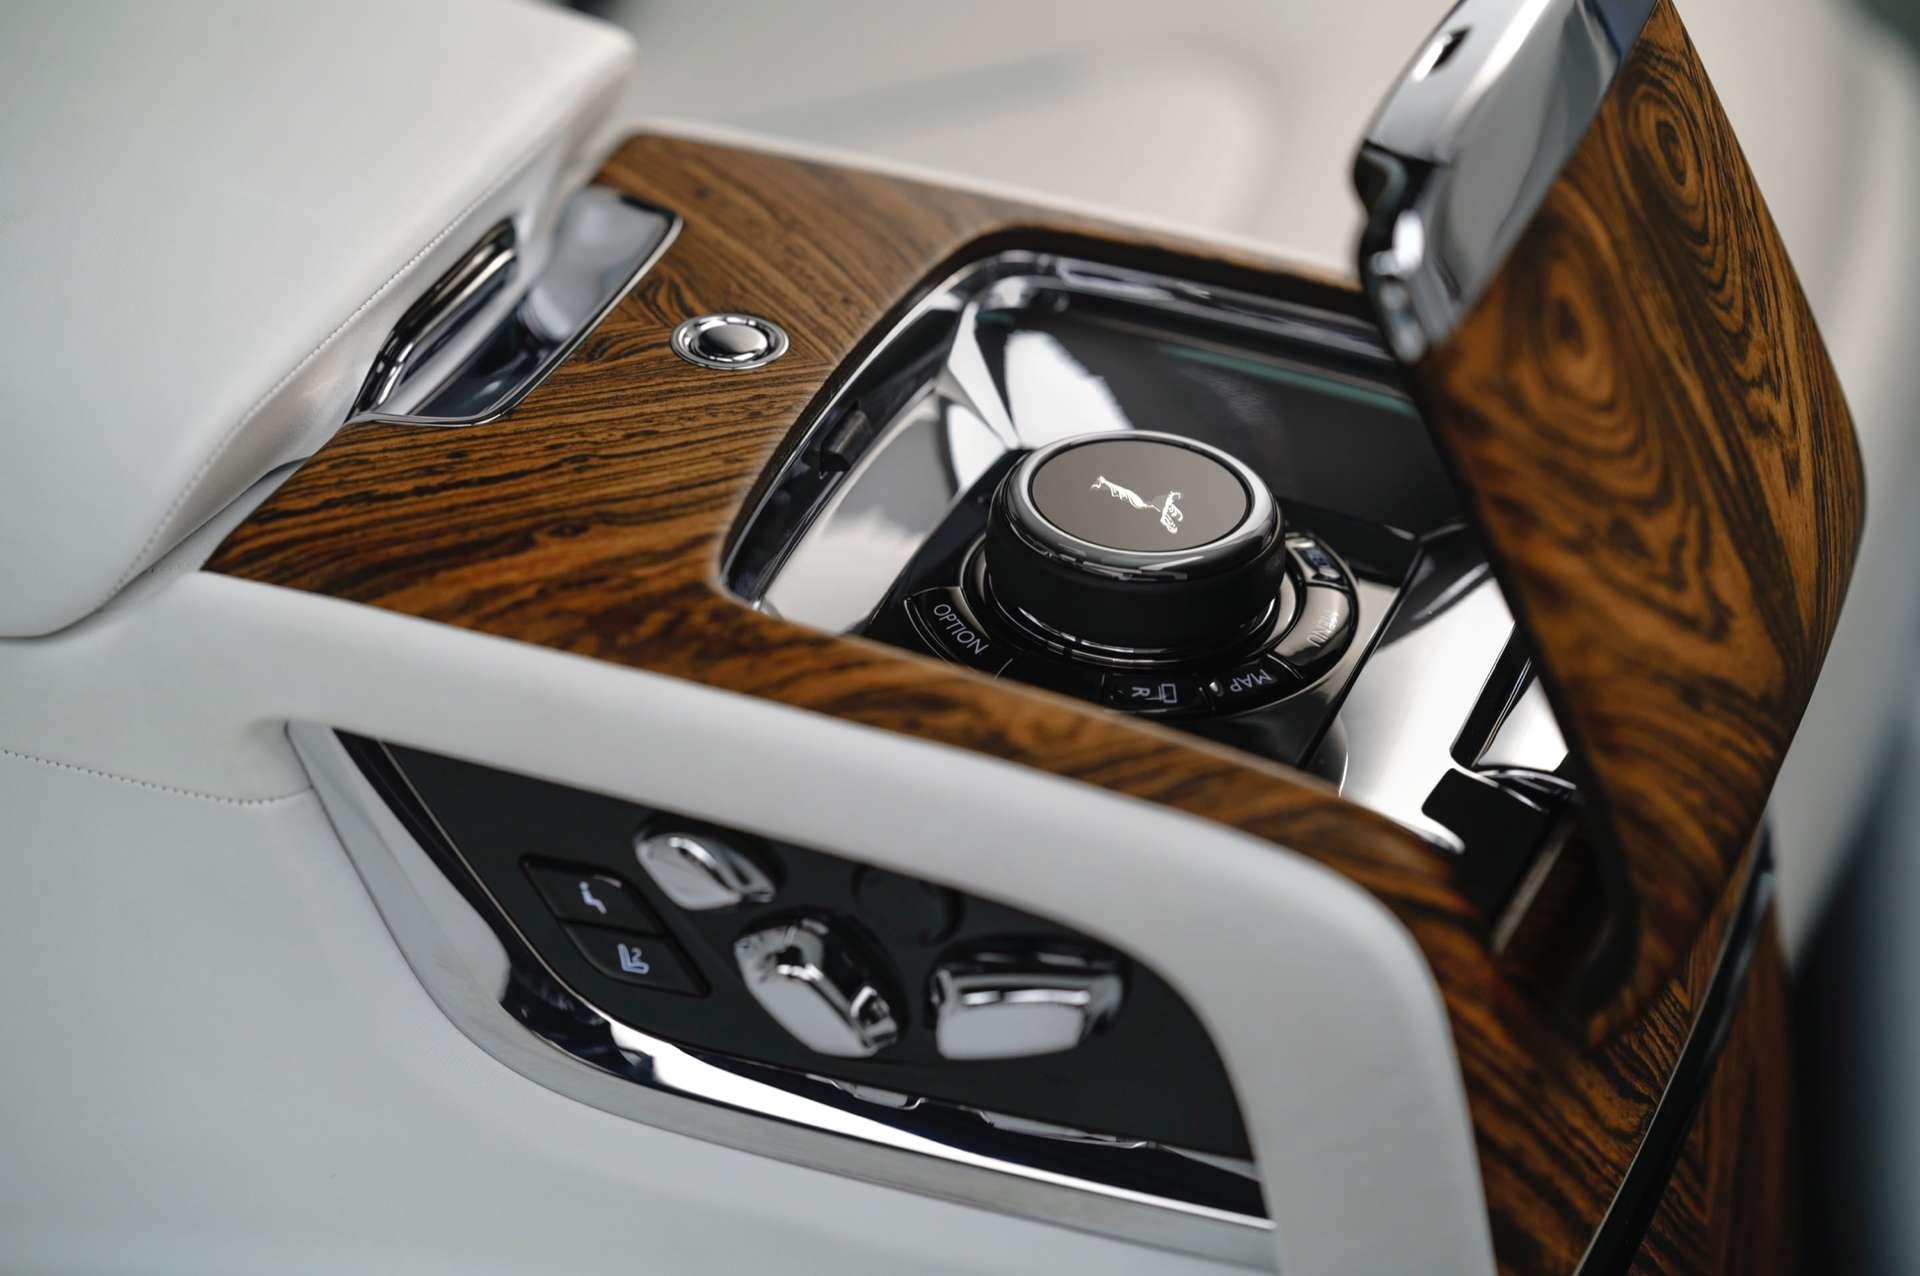 The interior controls in a Rolls-Royce Cullinan motor car